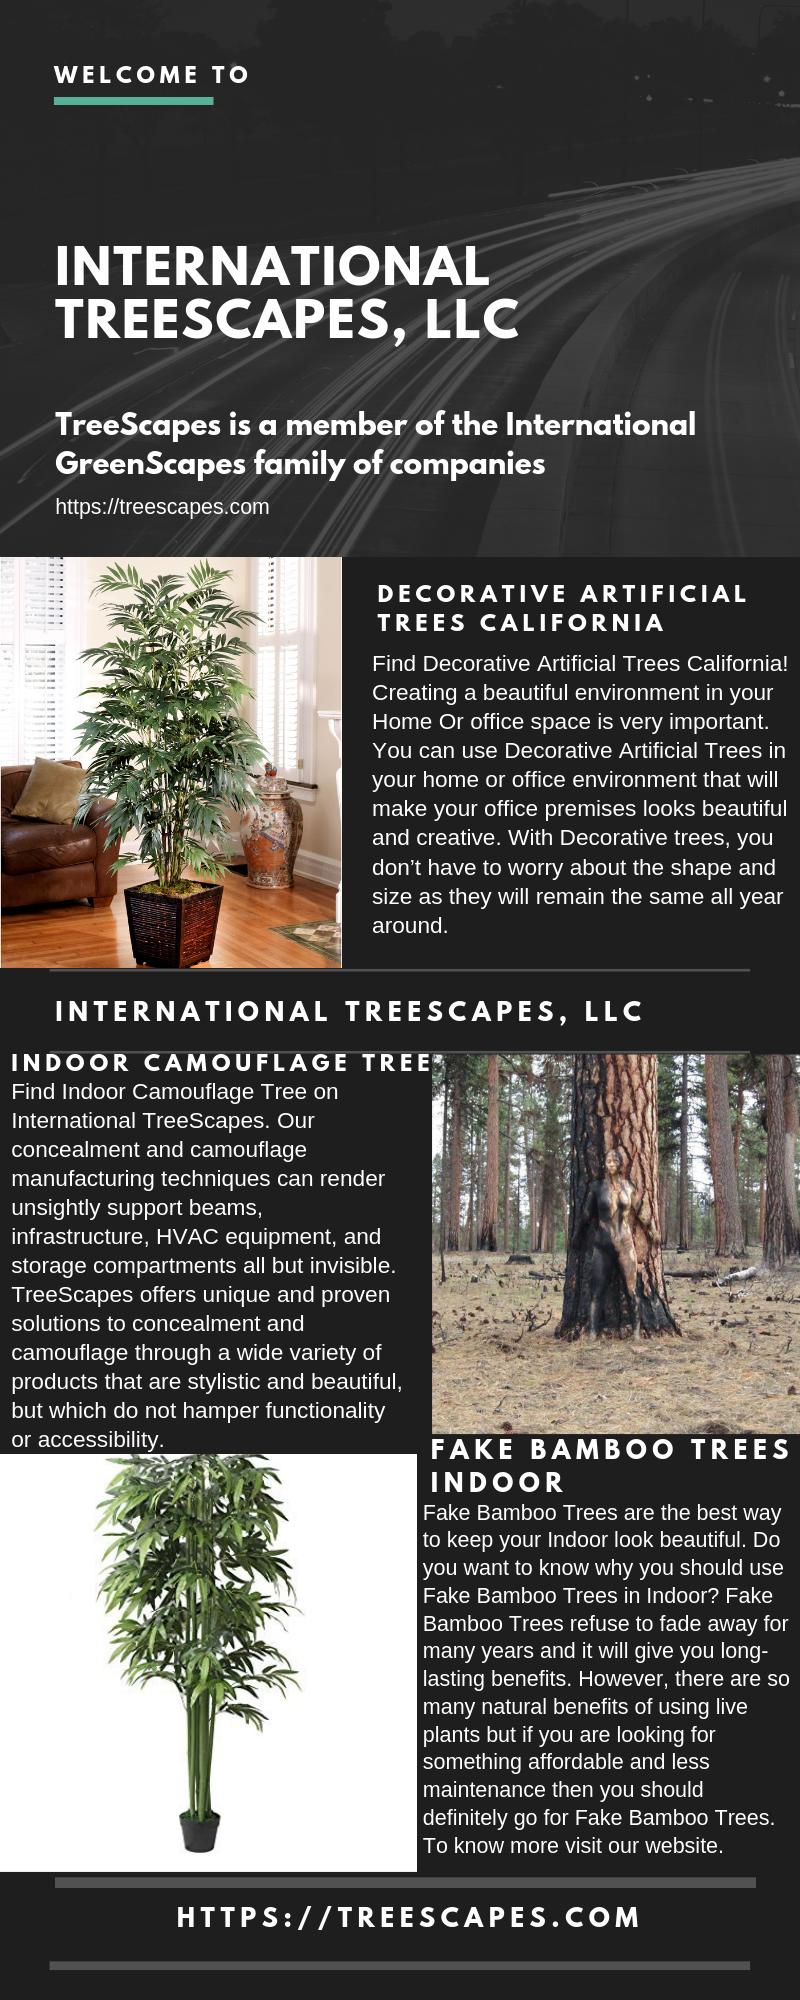 Decorative Artificial Trees California Artificial Trees Plant Companies Artificial Plants